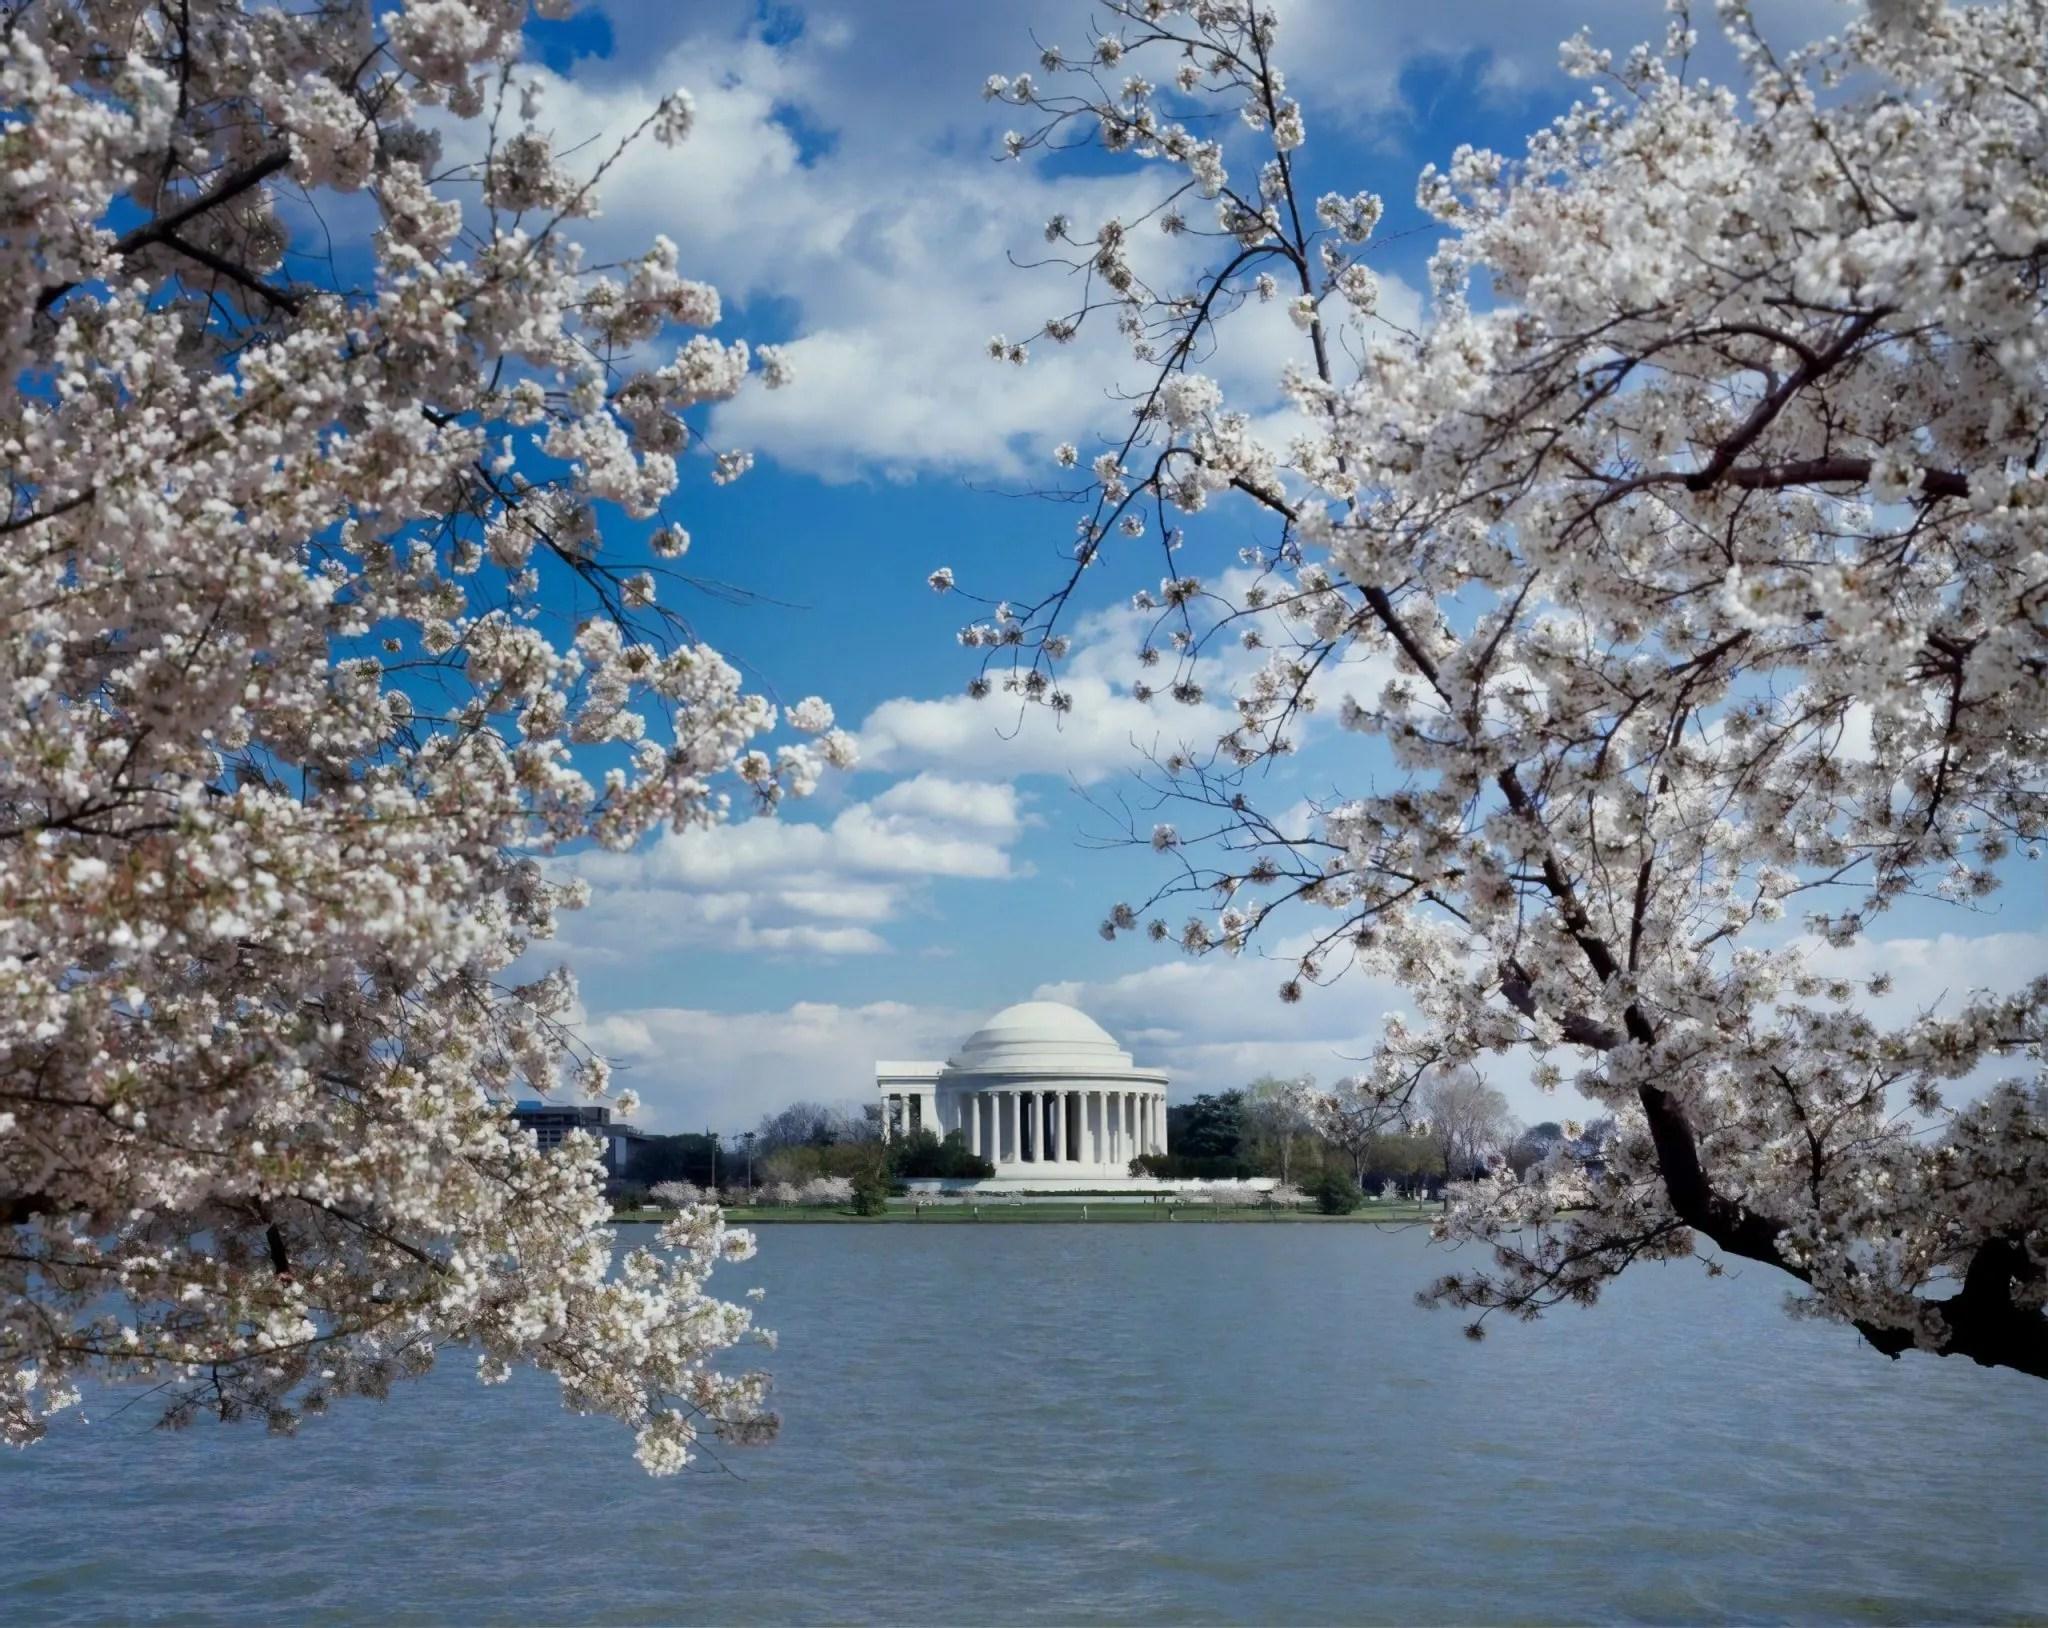 Jefferson Memorial in Washington D.C.